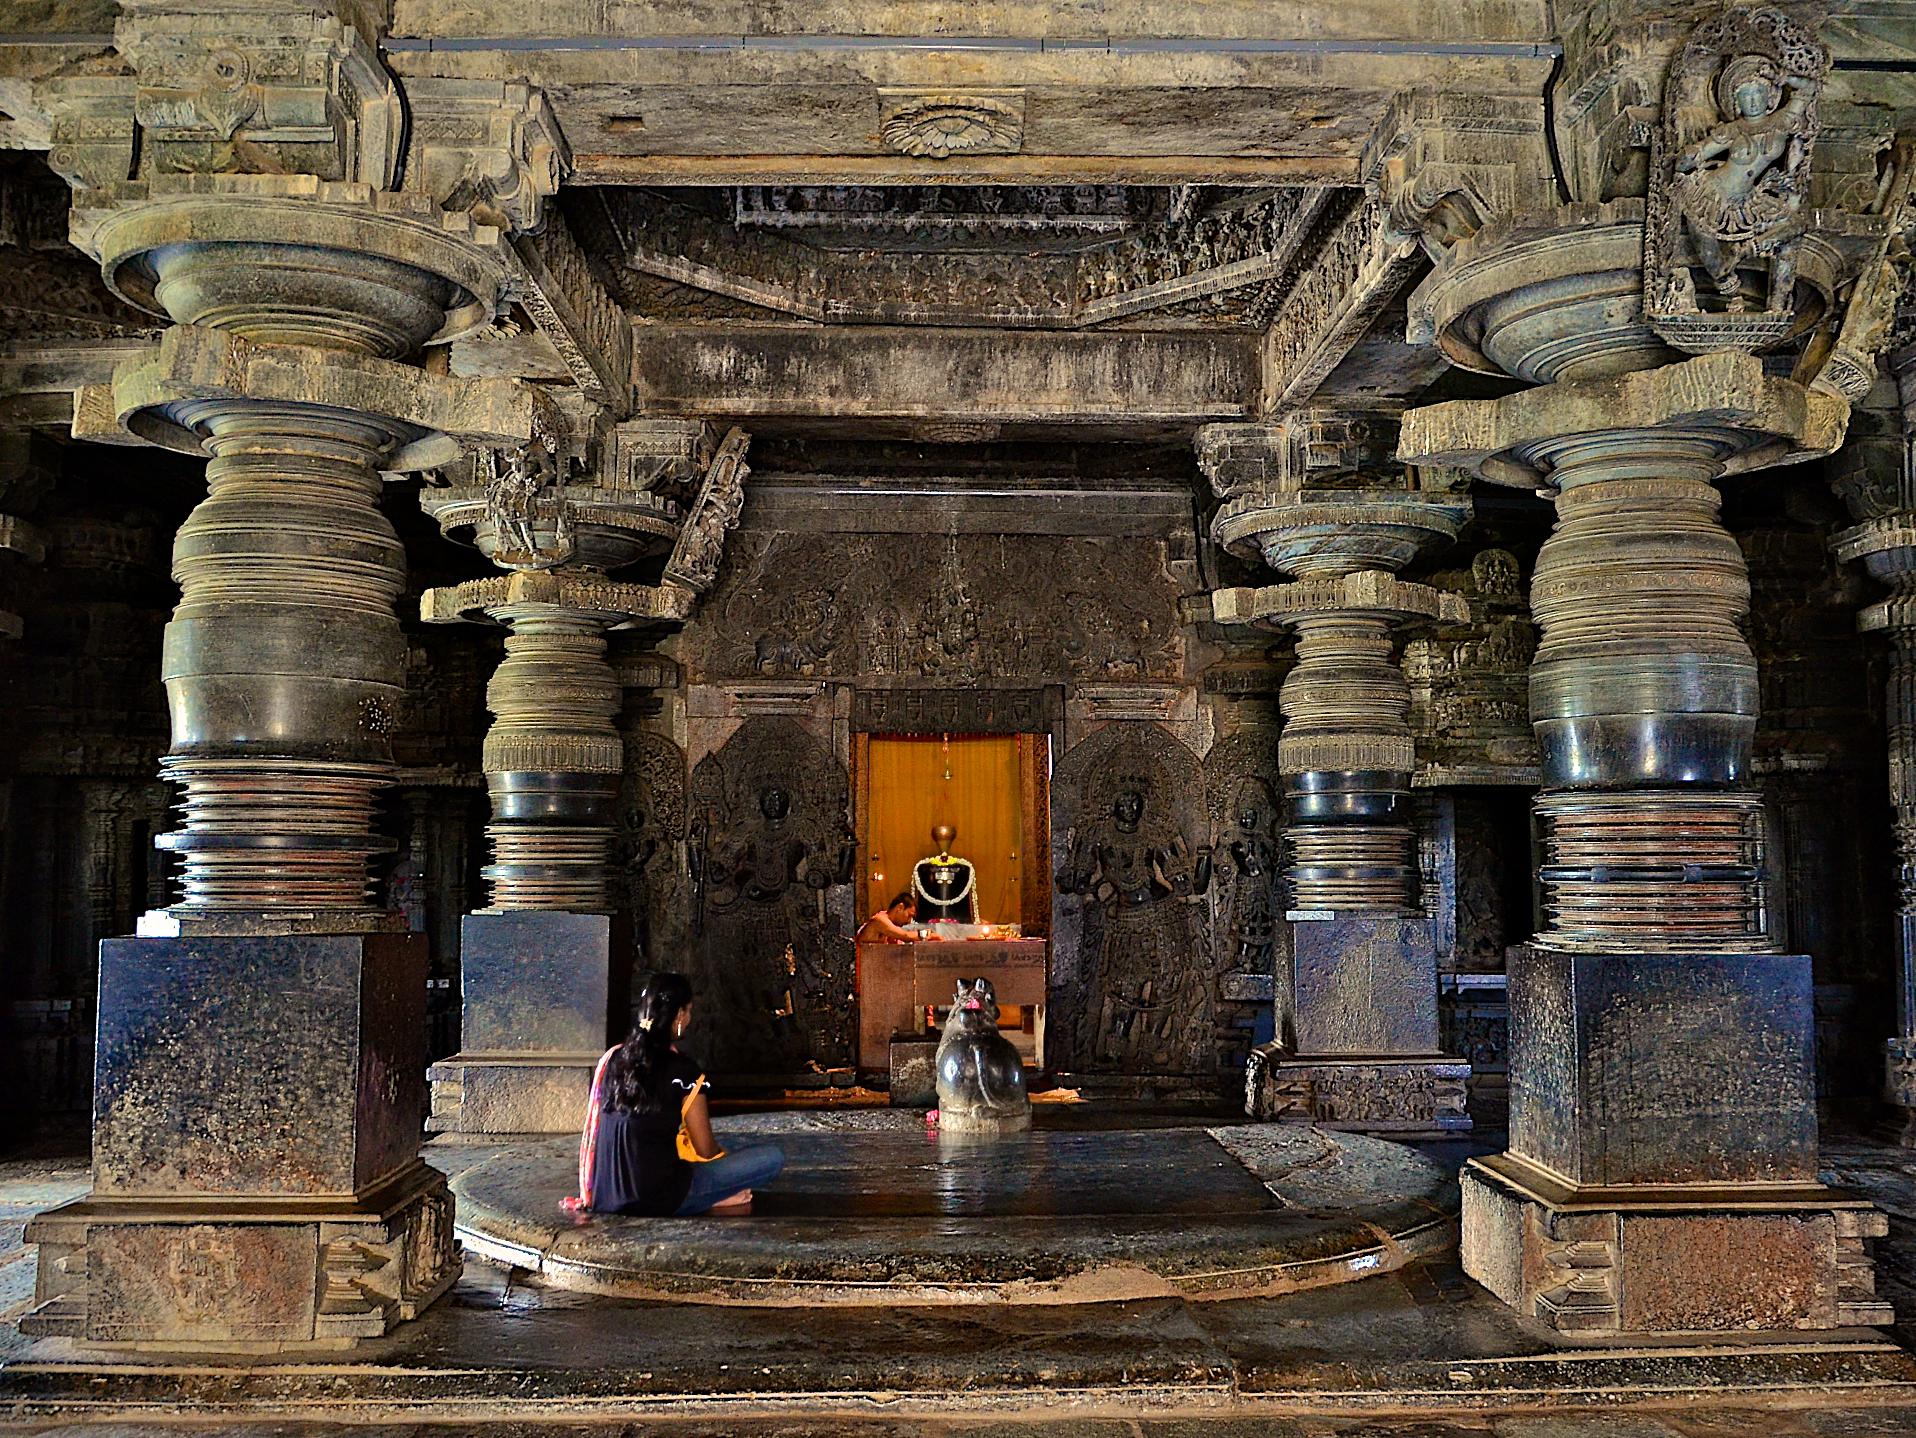 File:A sanctum inside the Hoysaleshwara temple in Halebidu.jpg ...